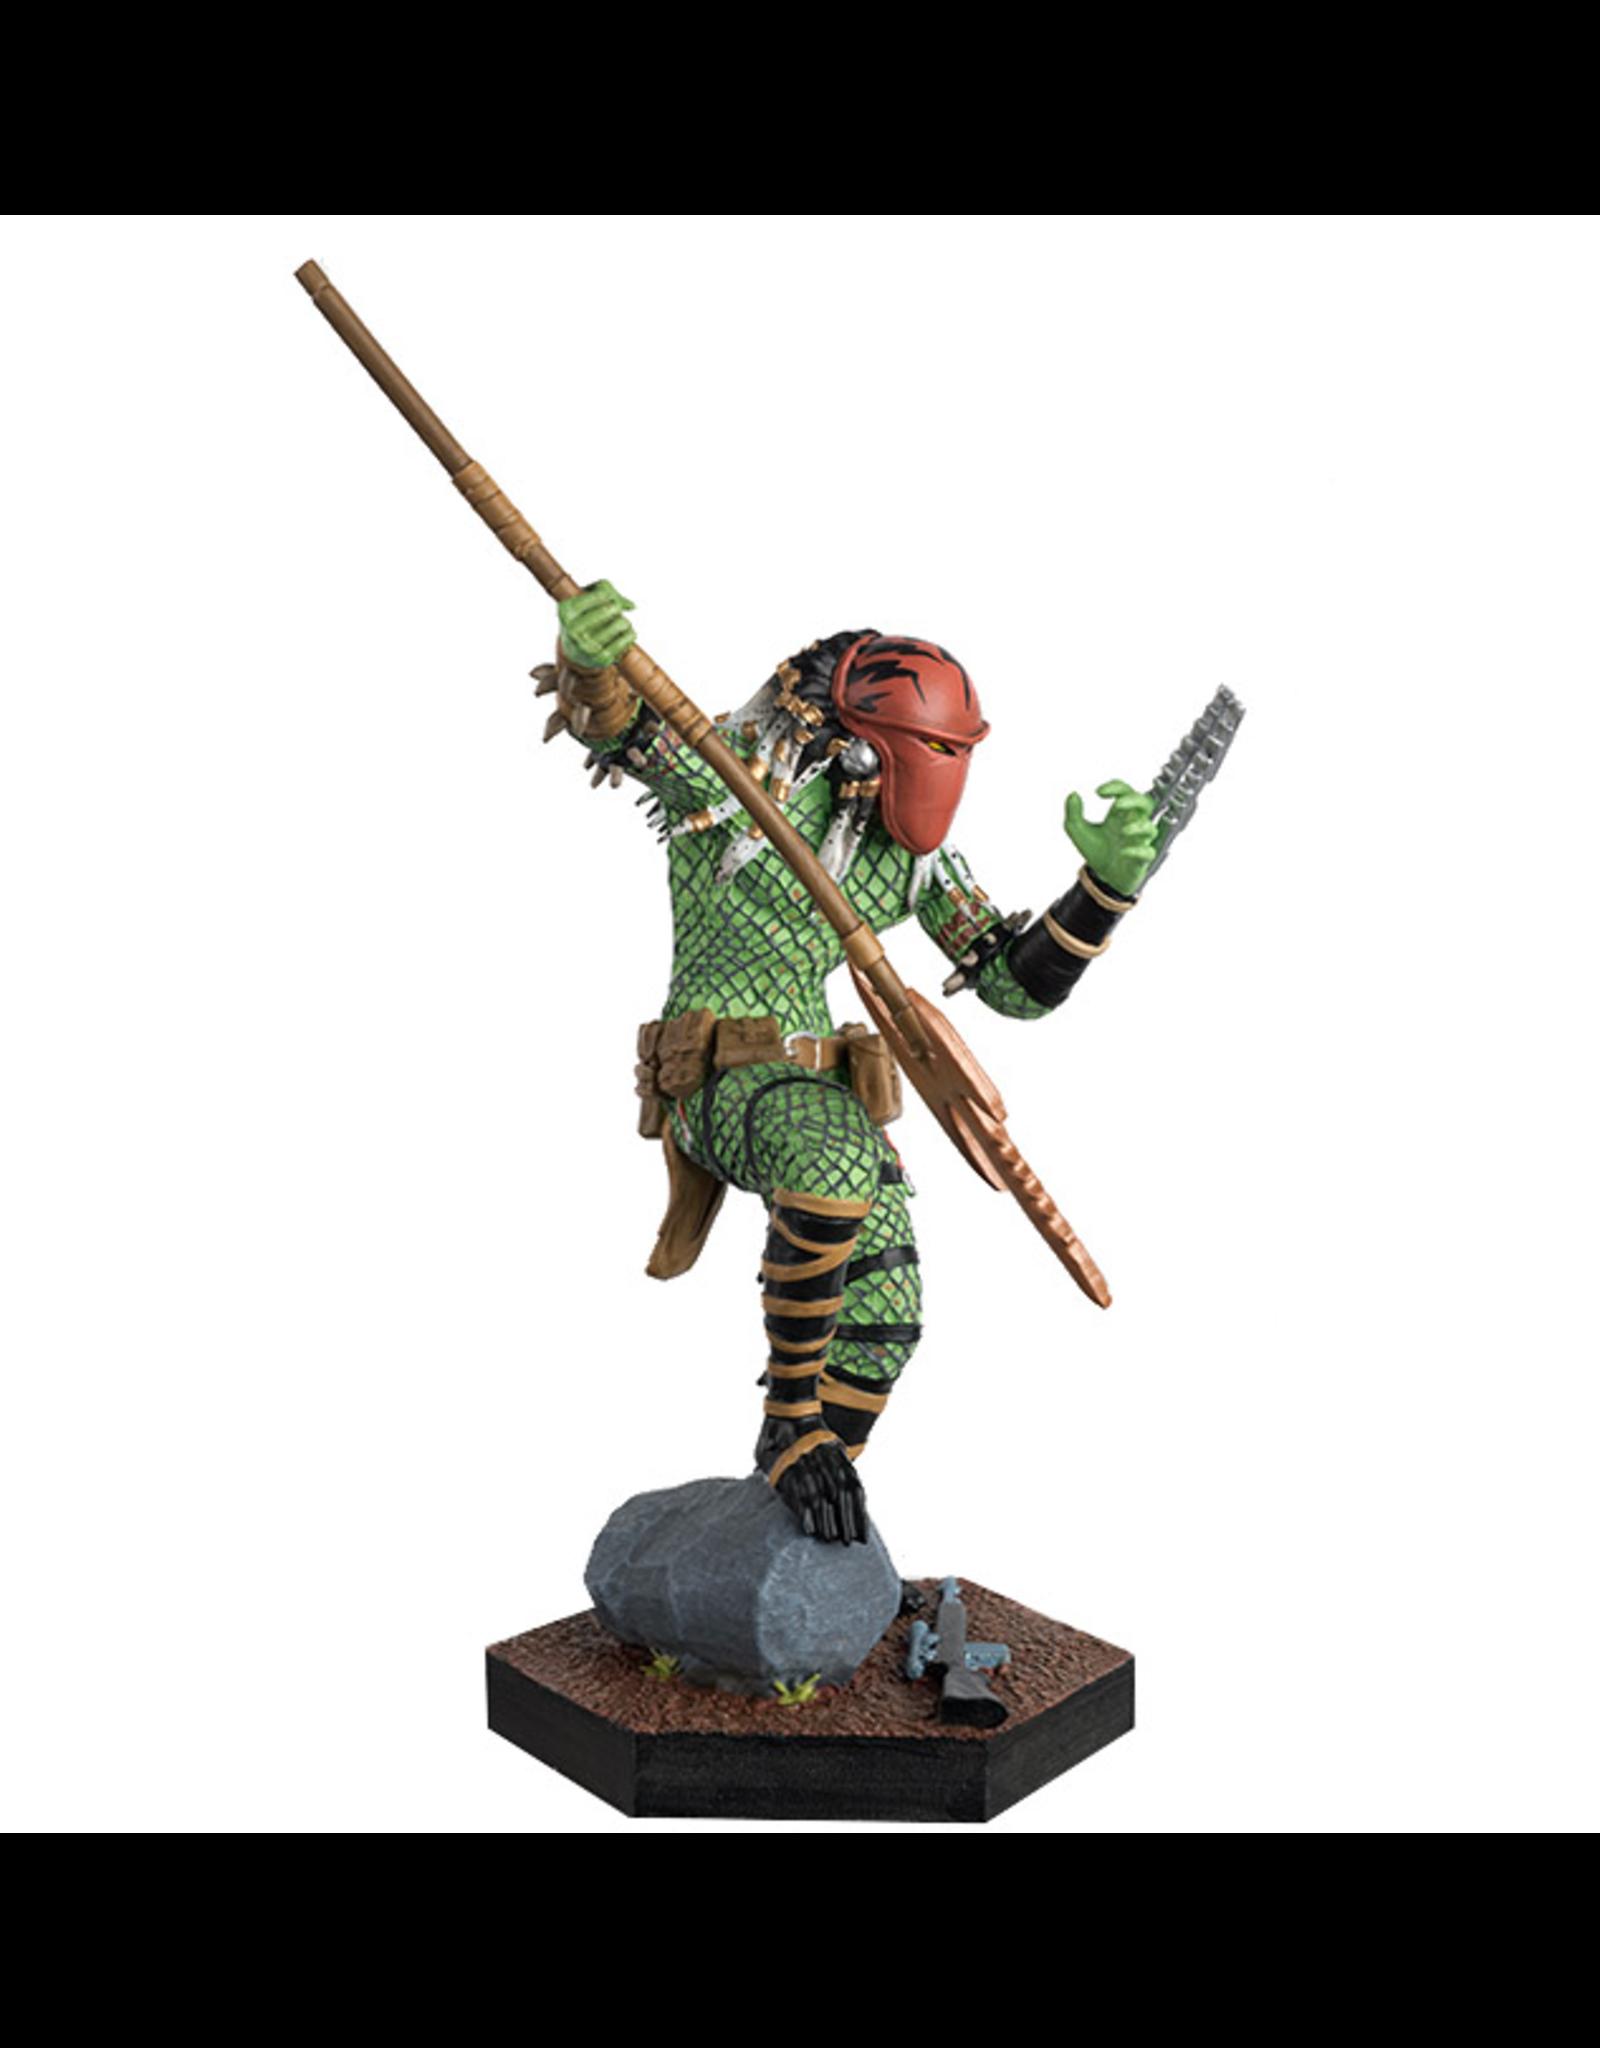 Eaglemoss ALIEN & PREDATOR Figurine Collection 1/16 13cm - Homeworld Predator